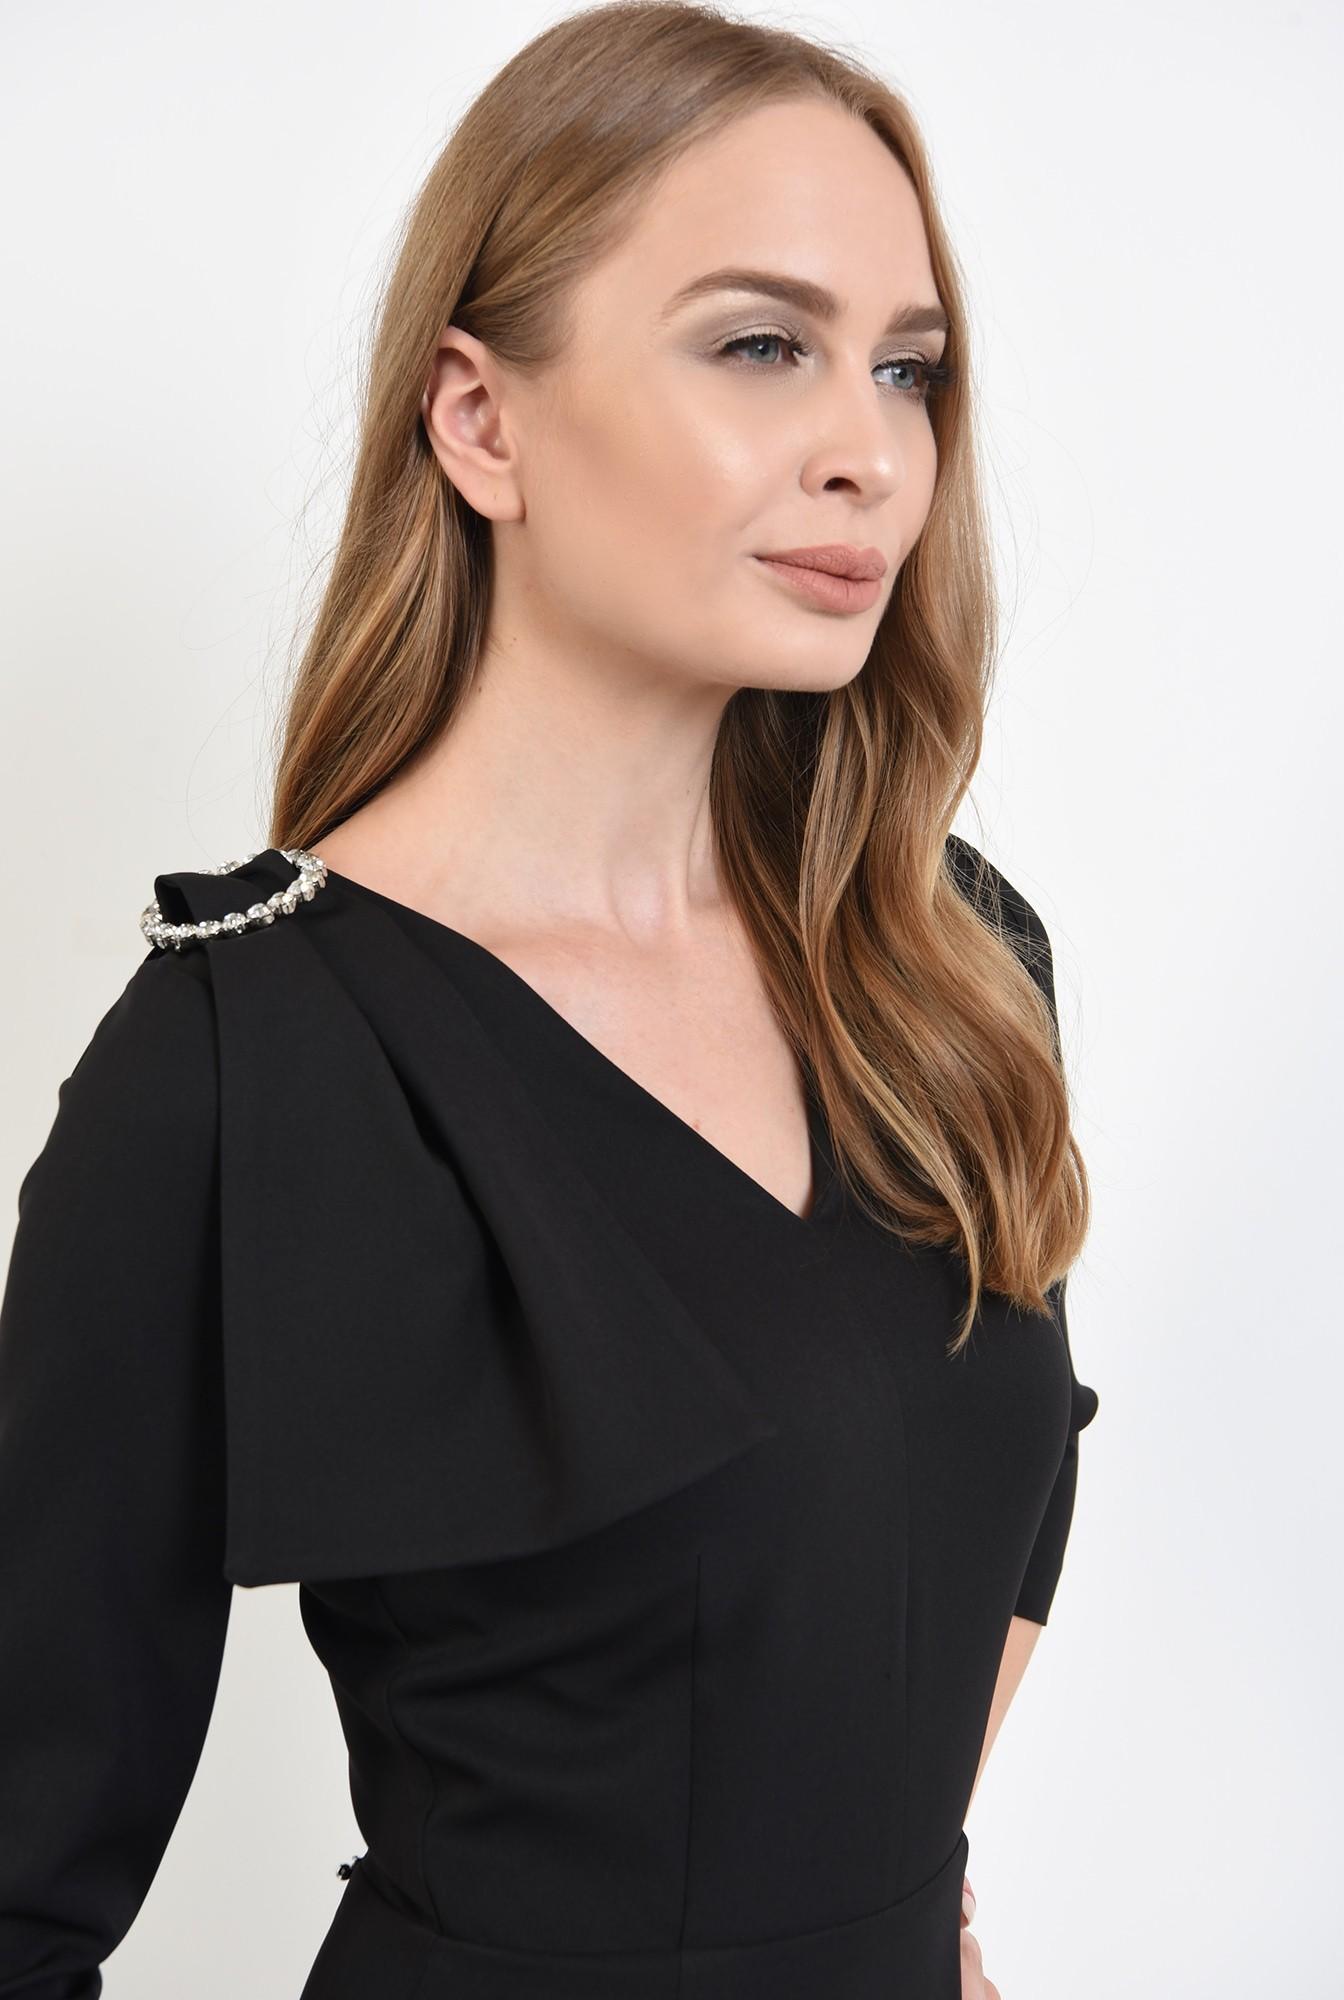 2 - 360 - rochie poema, negra, eleganta, cu funda